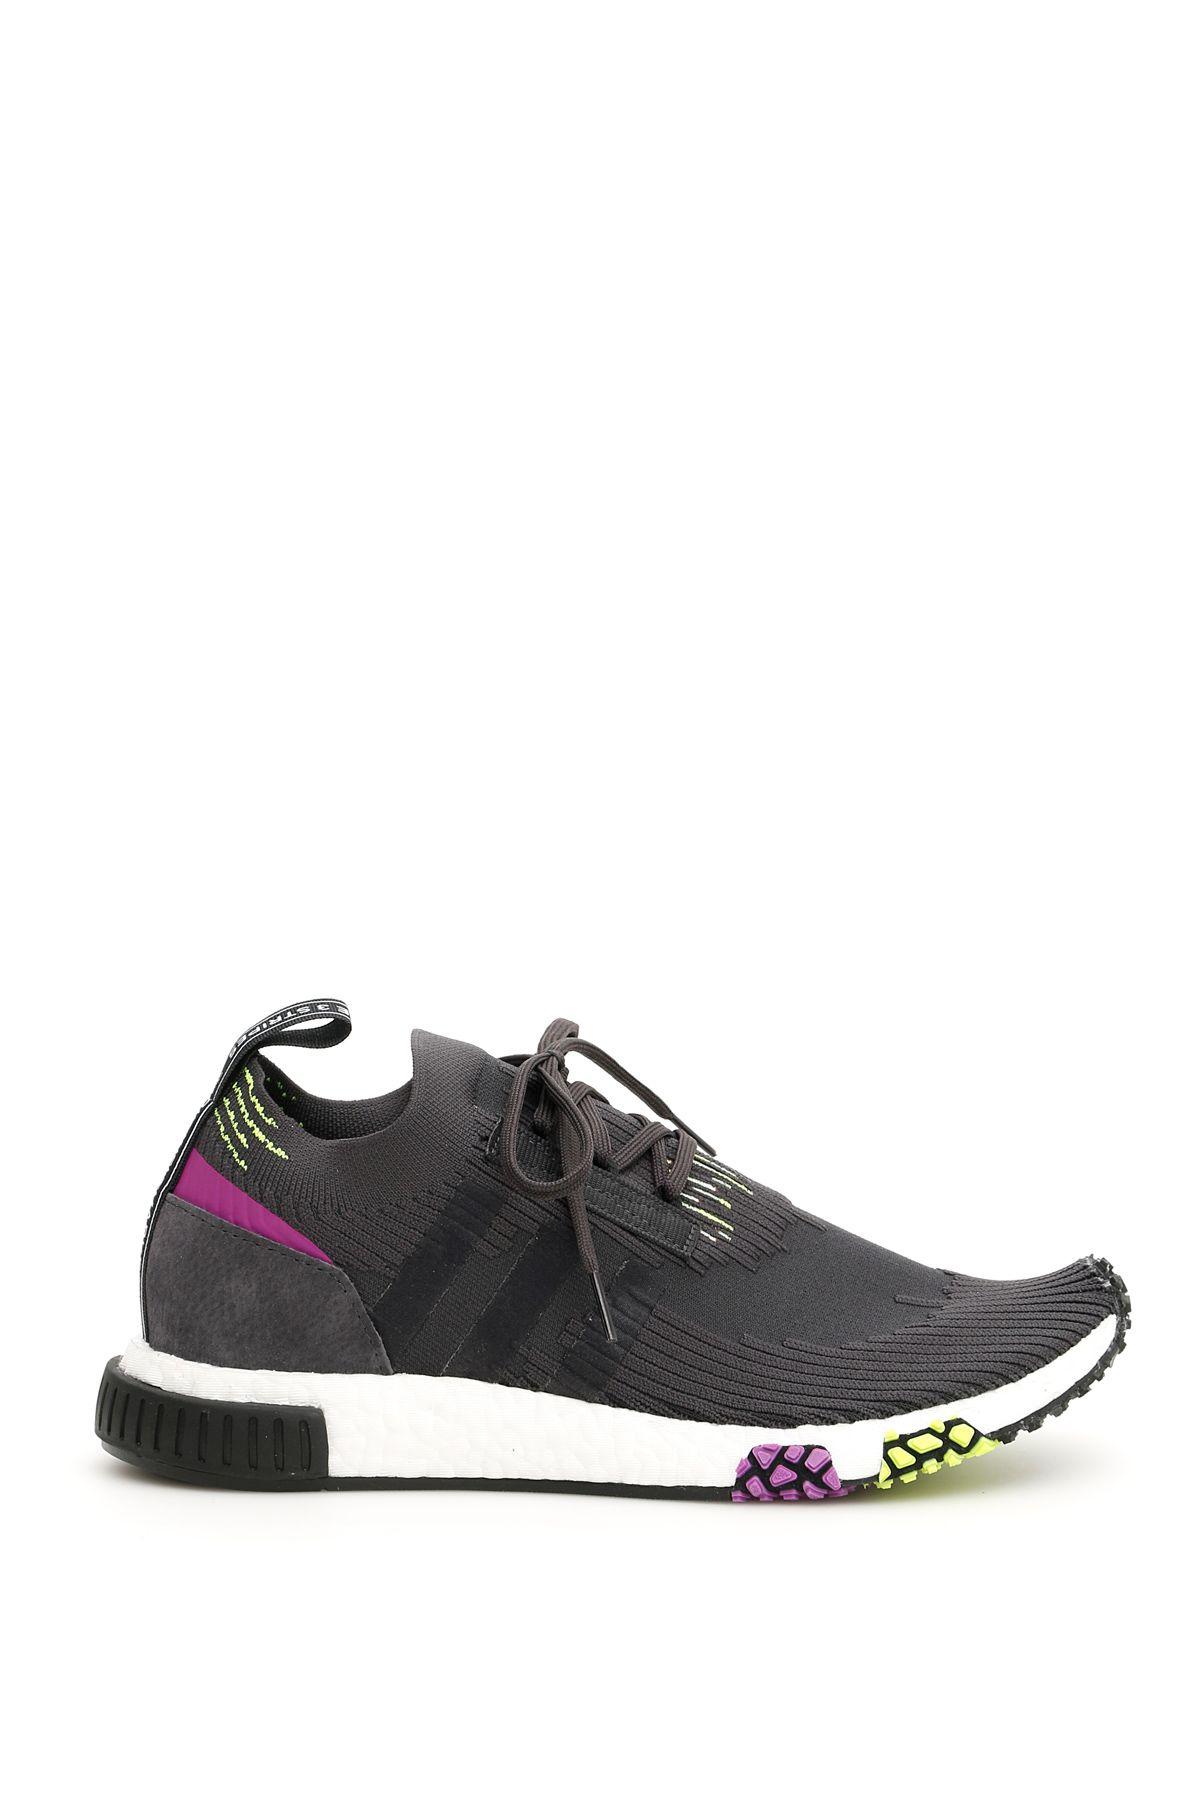 f84c823510ef ADIDAS ORIGINALS. Adidas Nmd Racer Sneakers in Carbon Core Black Solar  Yellow